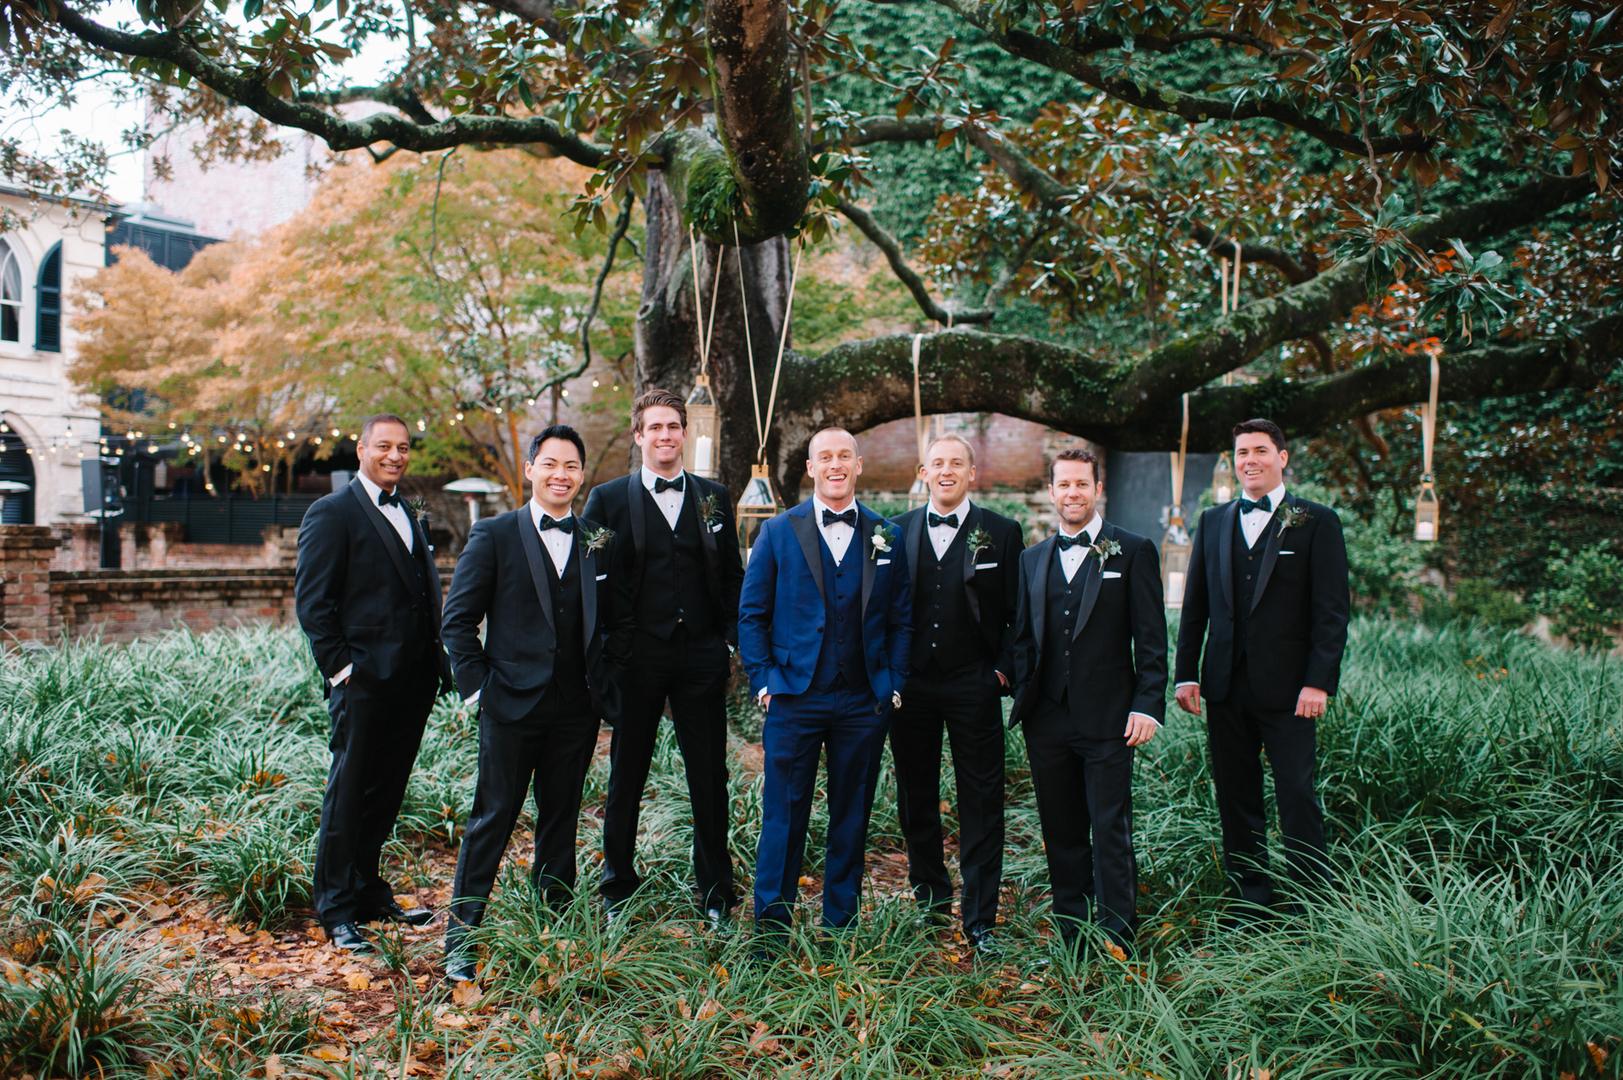 william-aiken-house-wedding-25.jpg